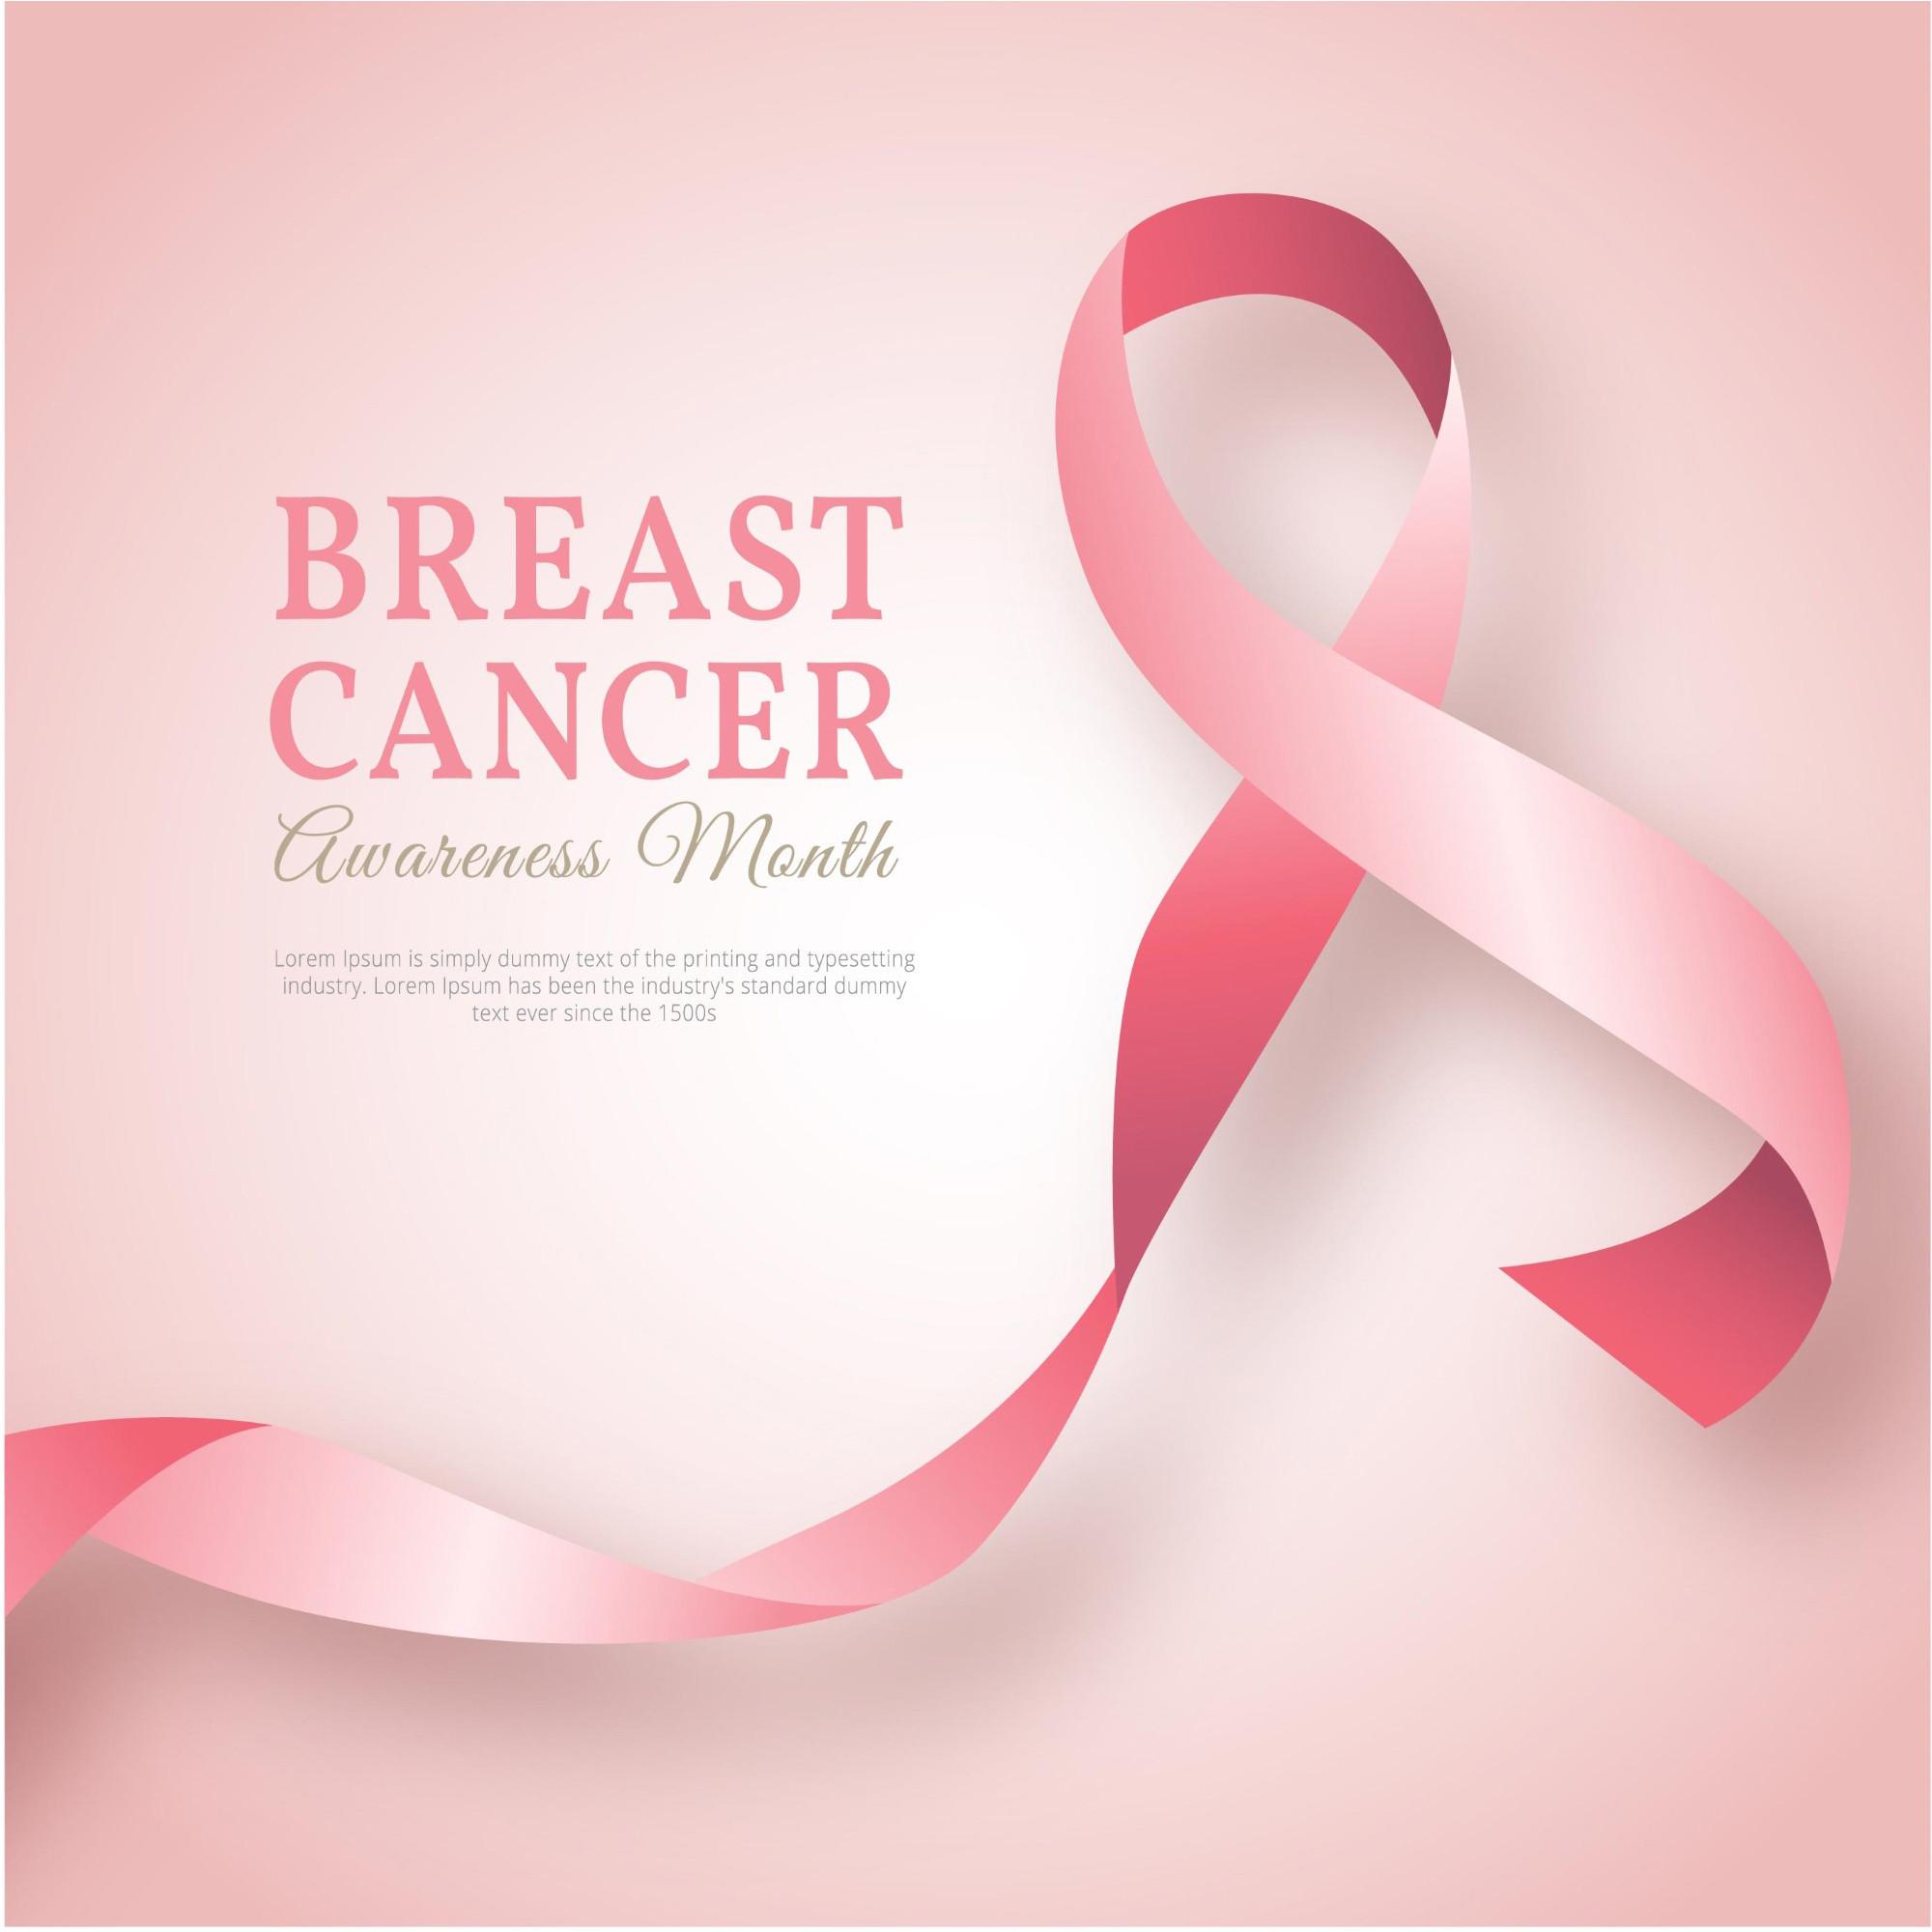 1920x1080 Nfl Breast Cancer Wallpaper